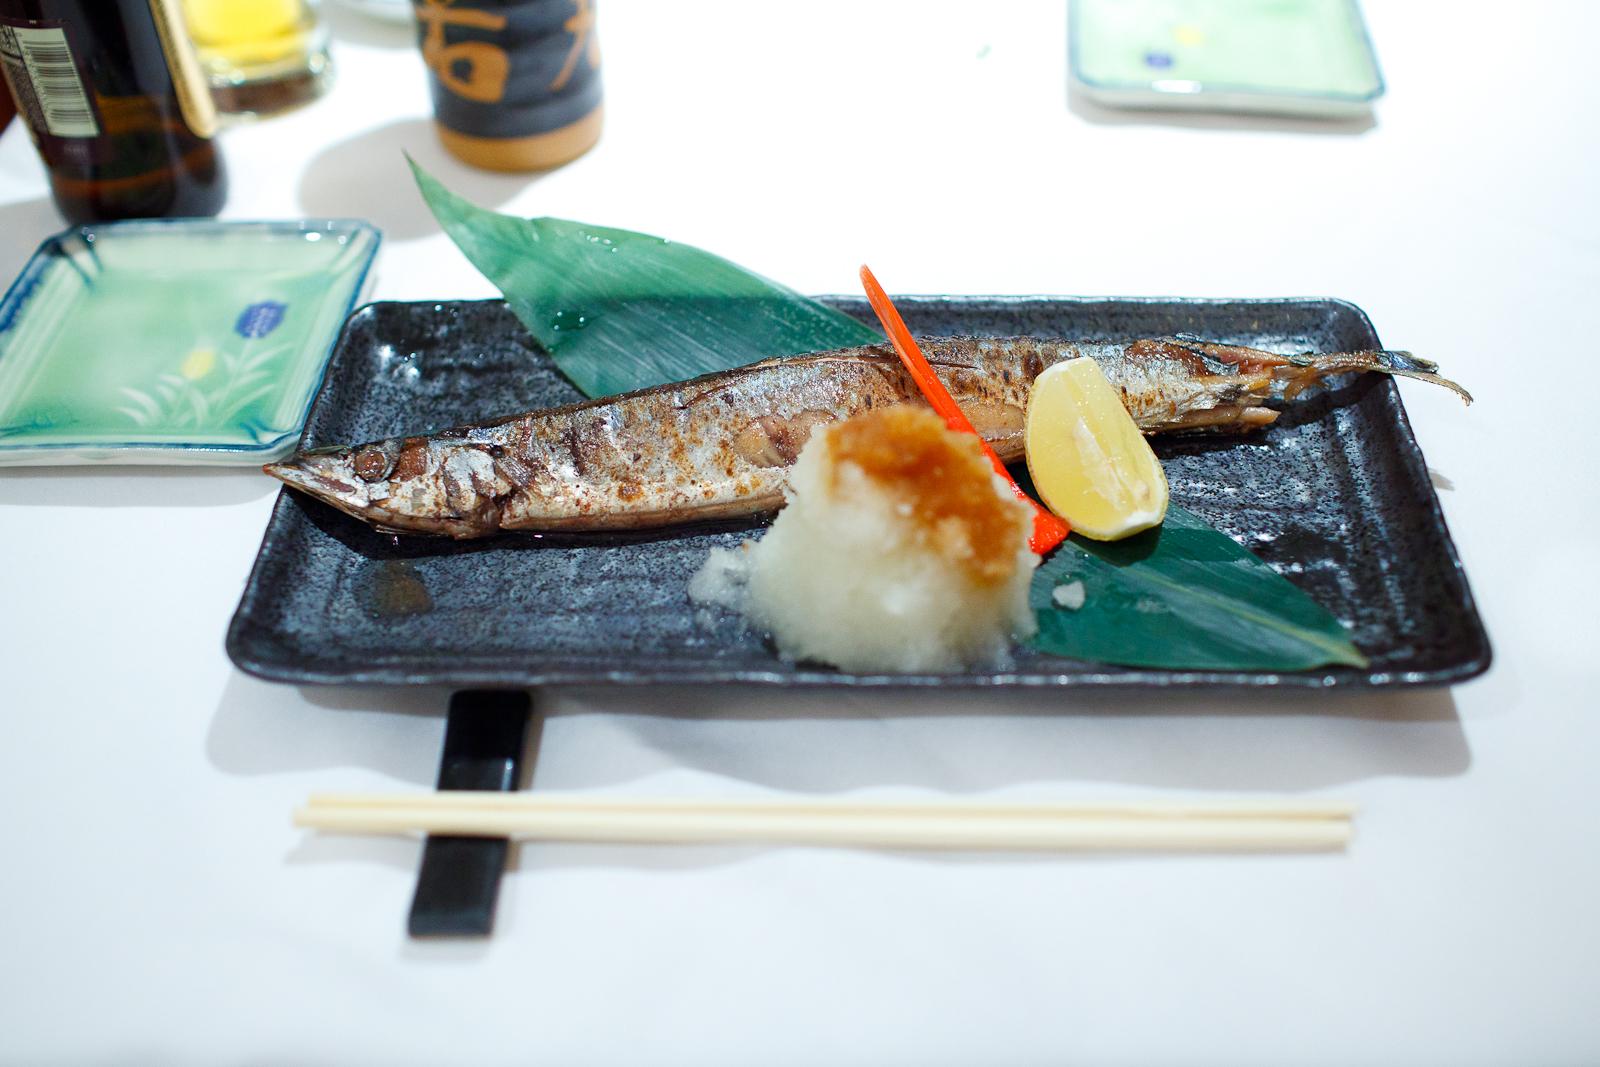 Soy sauce marinated white fish, daikon radish